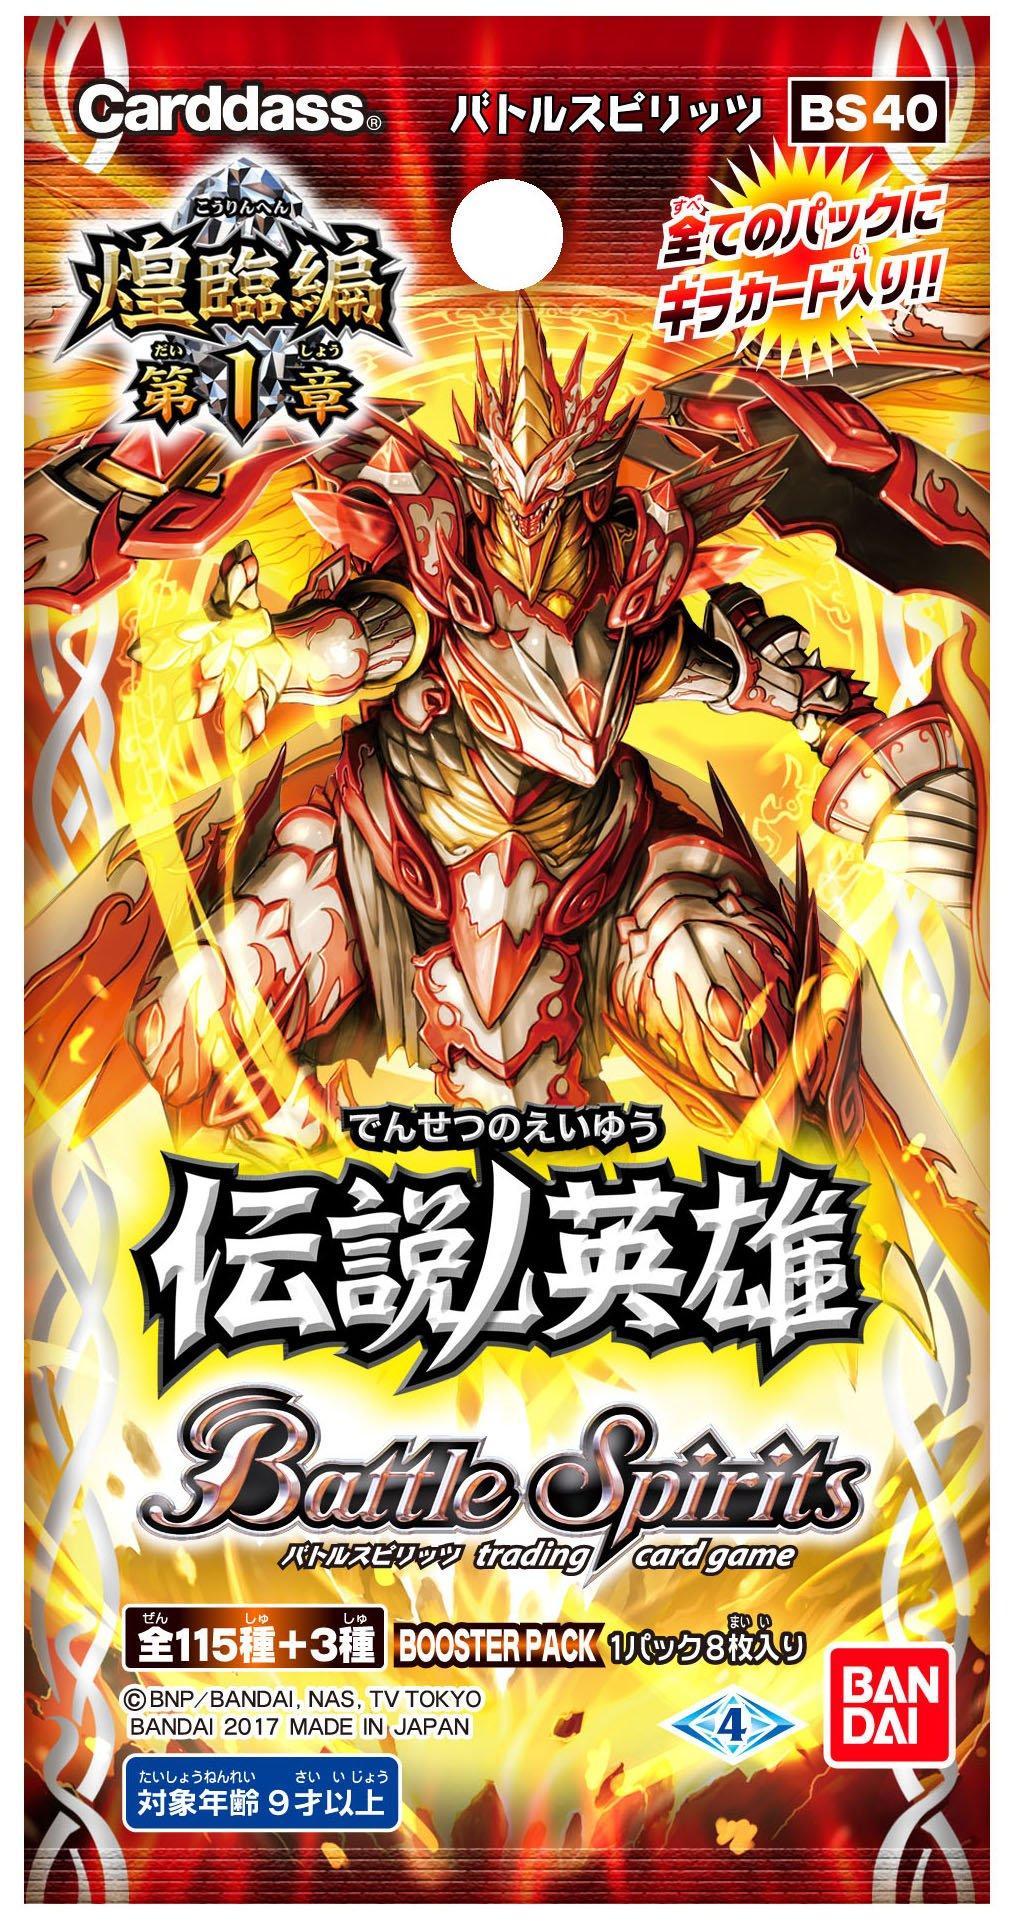 Legend of Roh hero BS40-RV008 Kyoshin machi Battle Spirits 煌臨 Hen Chapter 1